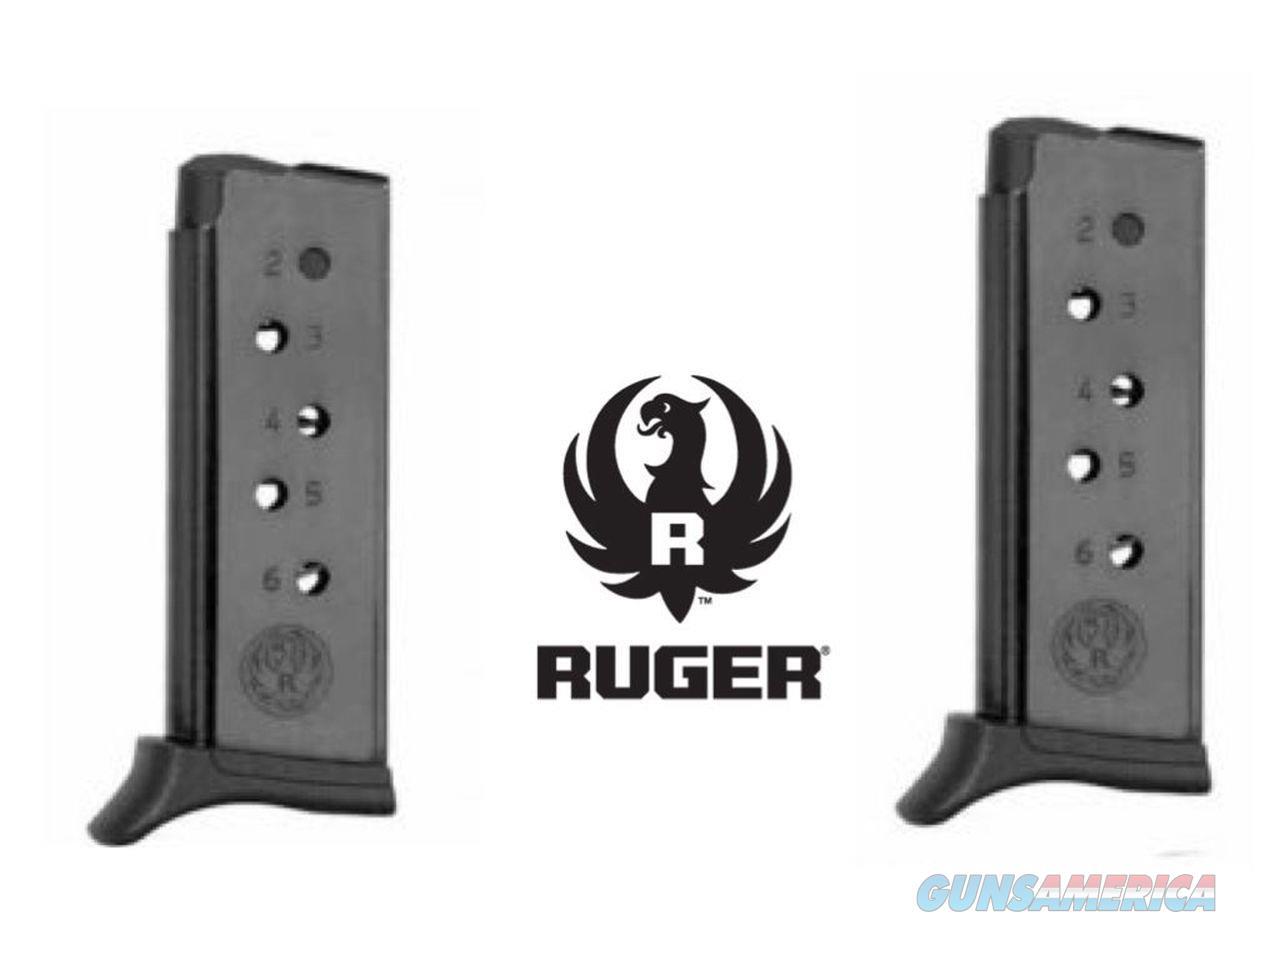 2 Pack Ruger Brand LCP 380 .380 6 Rd Magazine Mag Magazines Pinkie Rest USA MADE !!  Non-Guns > Ammunition